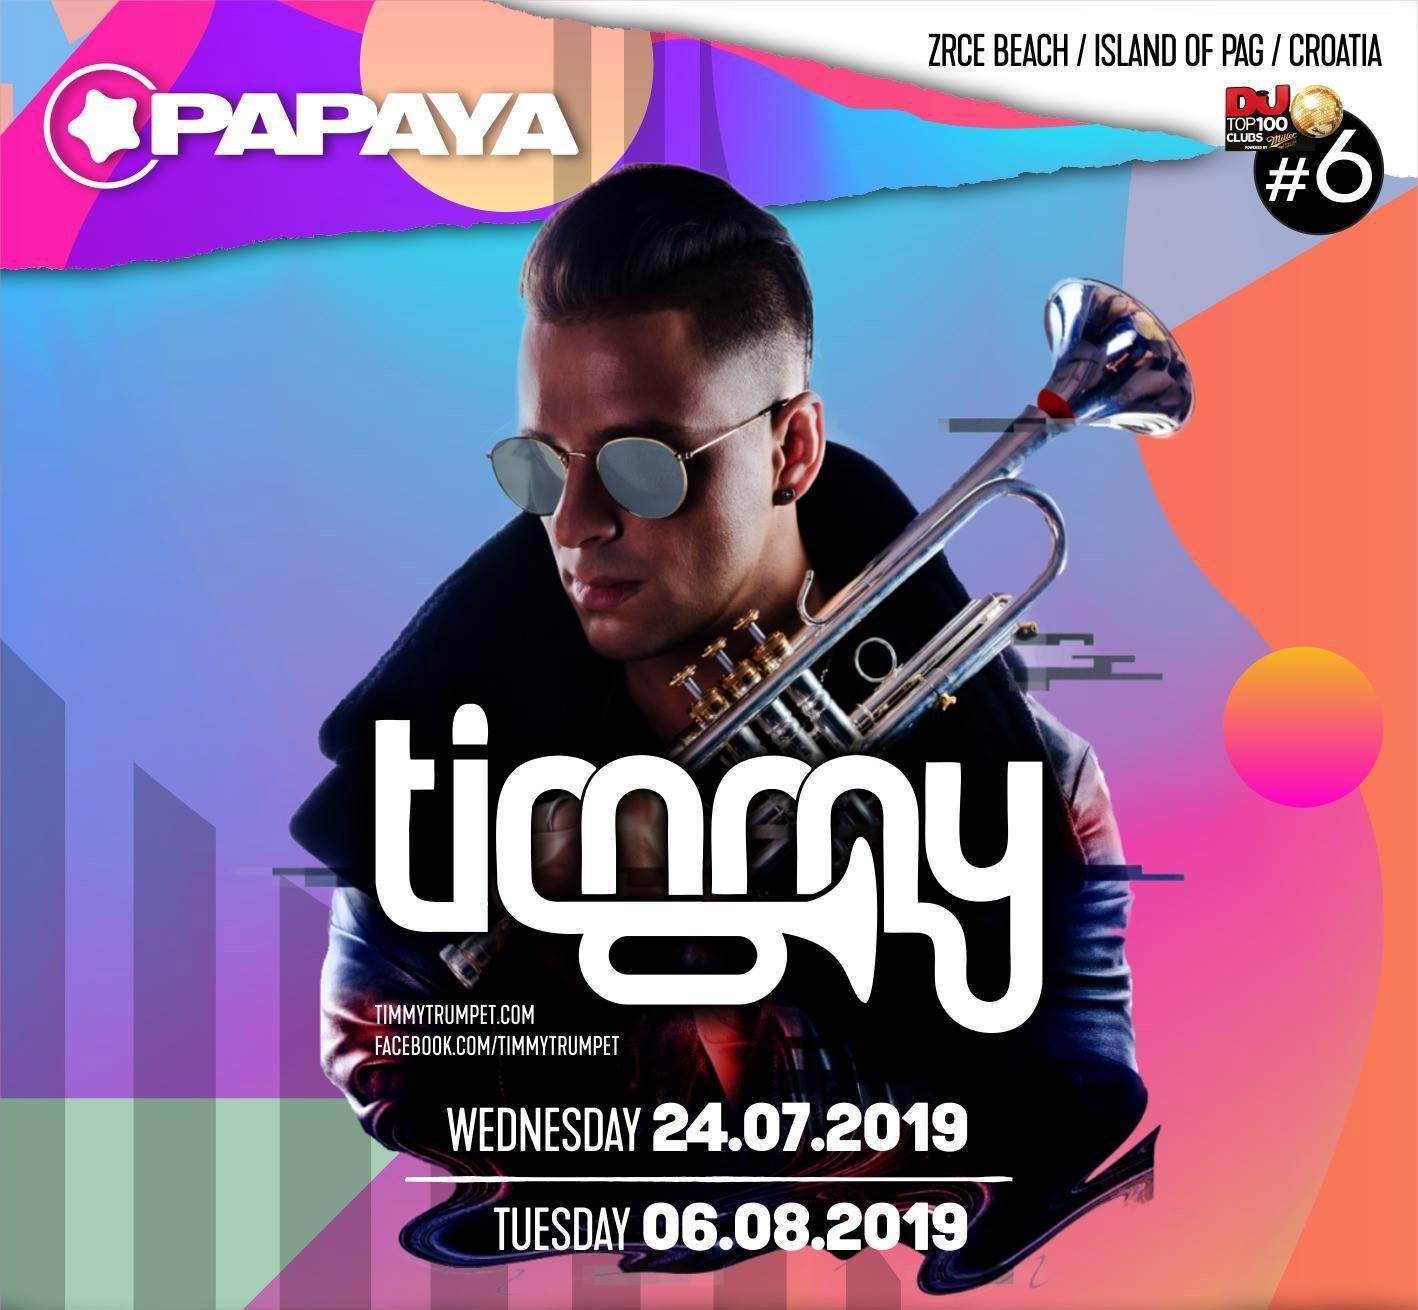 Timmy Trumpet 24 JUL 2019 Papaya club, Zrce beach, Island of Pag